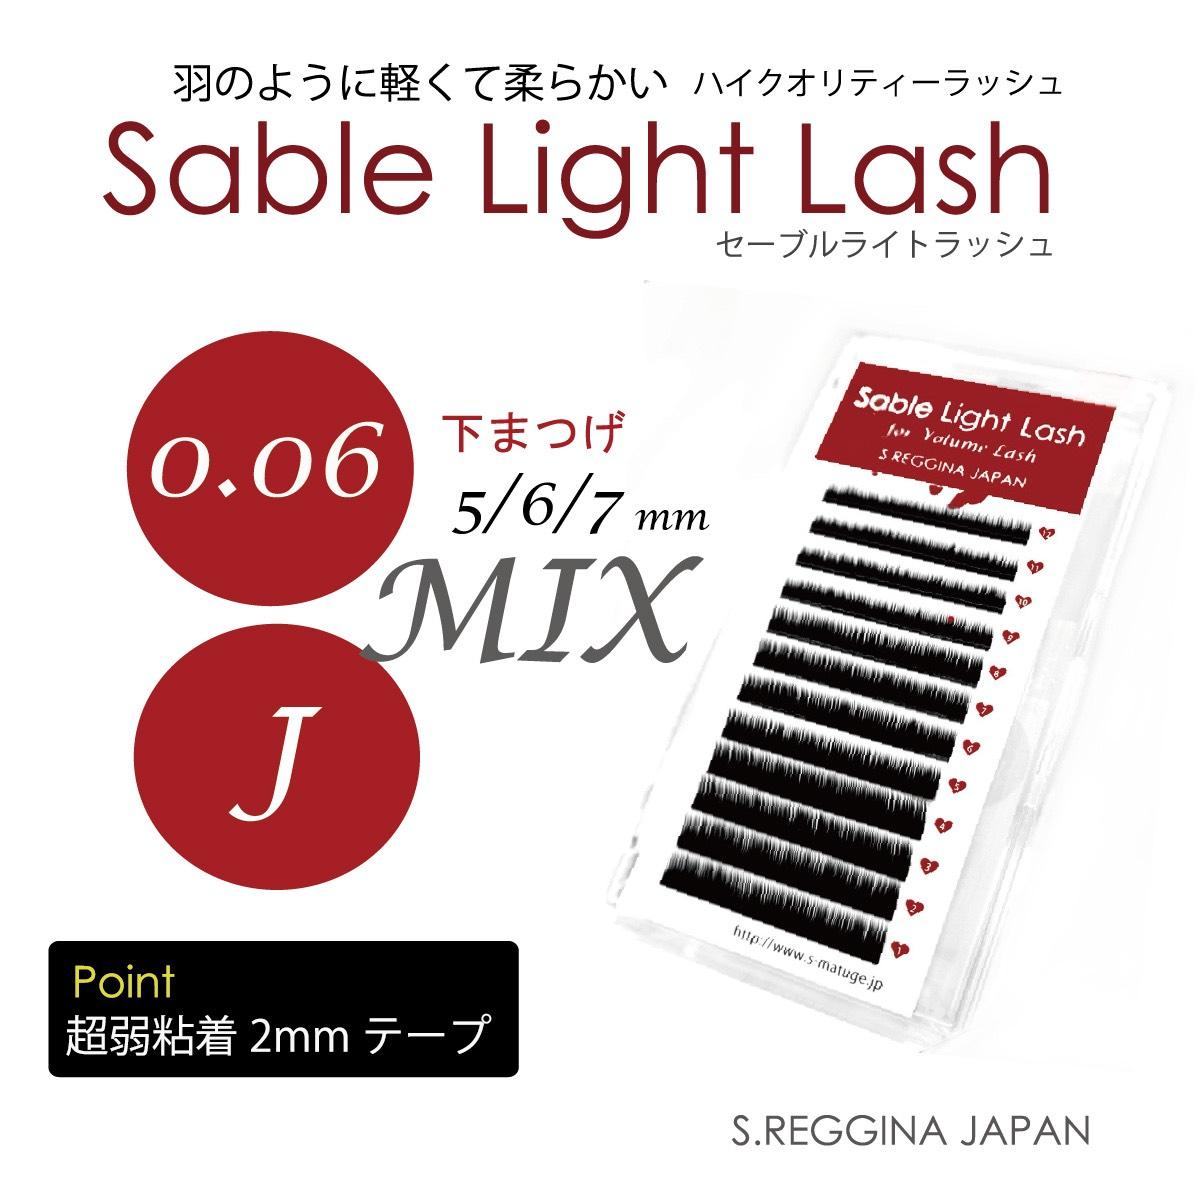 1mmの中の大きな違い超弱粘着2mmテープ採用 下まつげ 期間限定お試し価格 0.06 記念日 S.REGGINA セーブルライト J-0.06 6mm 7mm 下まつげミックス 5mm ボリュームラッシュ